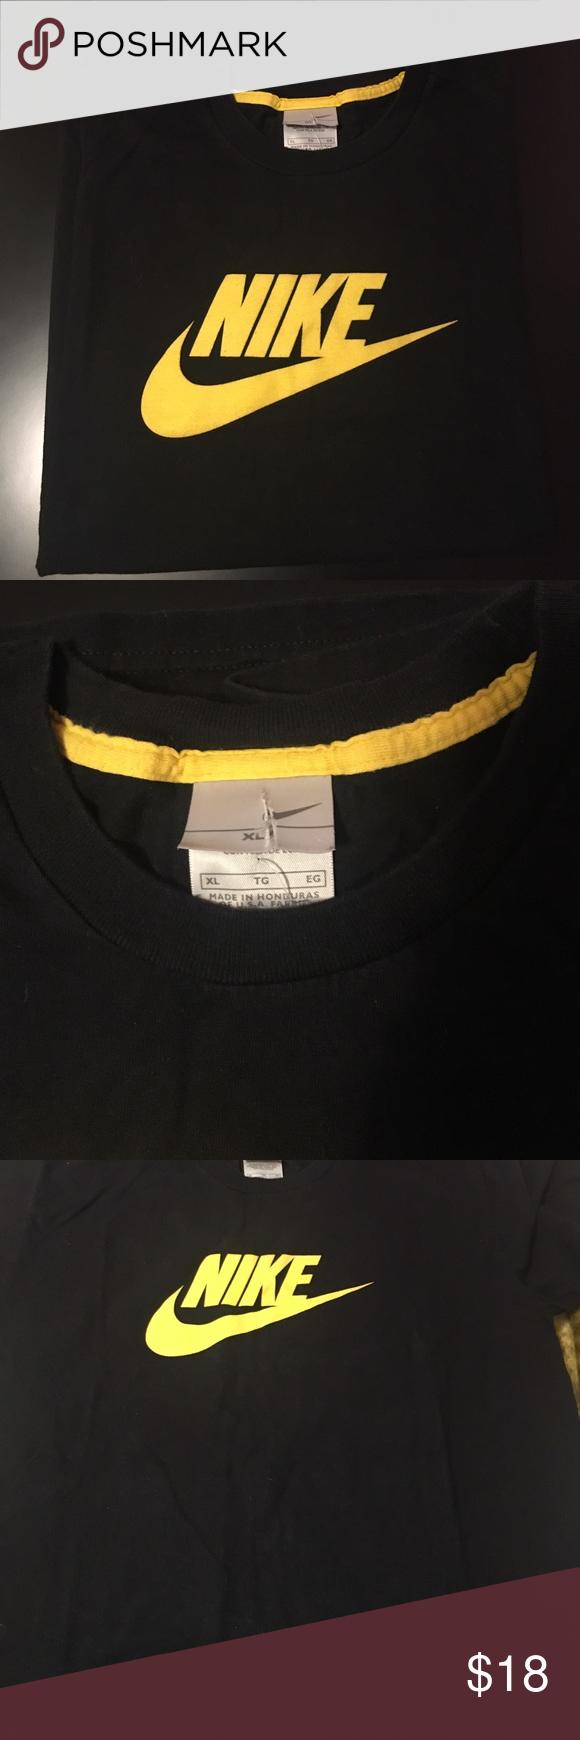 Men's Nike Black T shirt with yellow logo XL